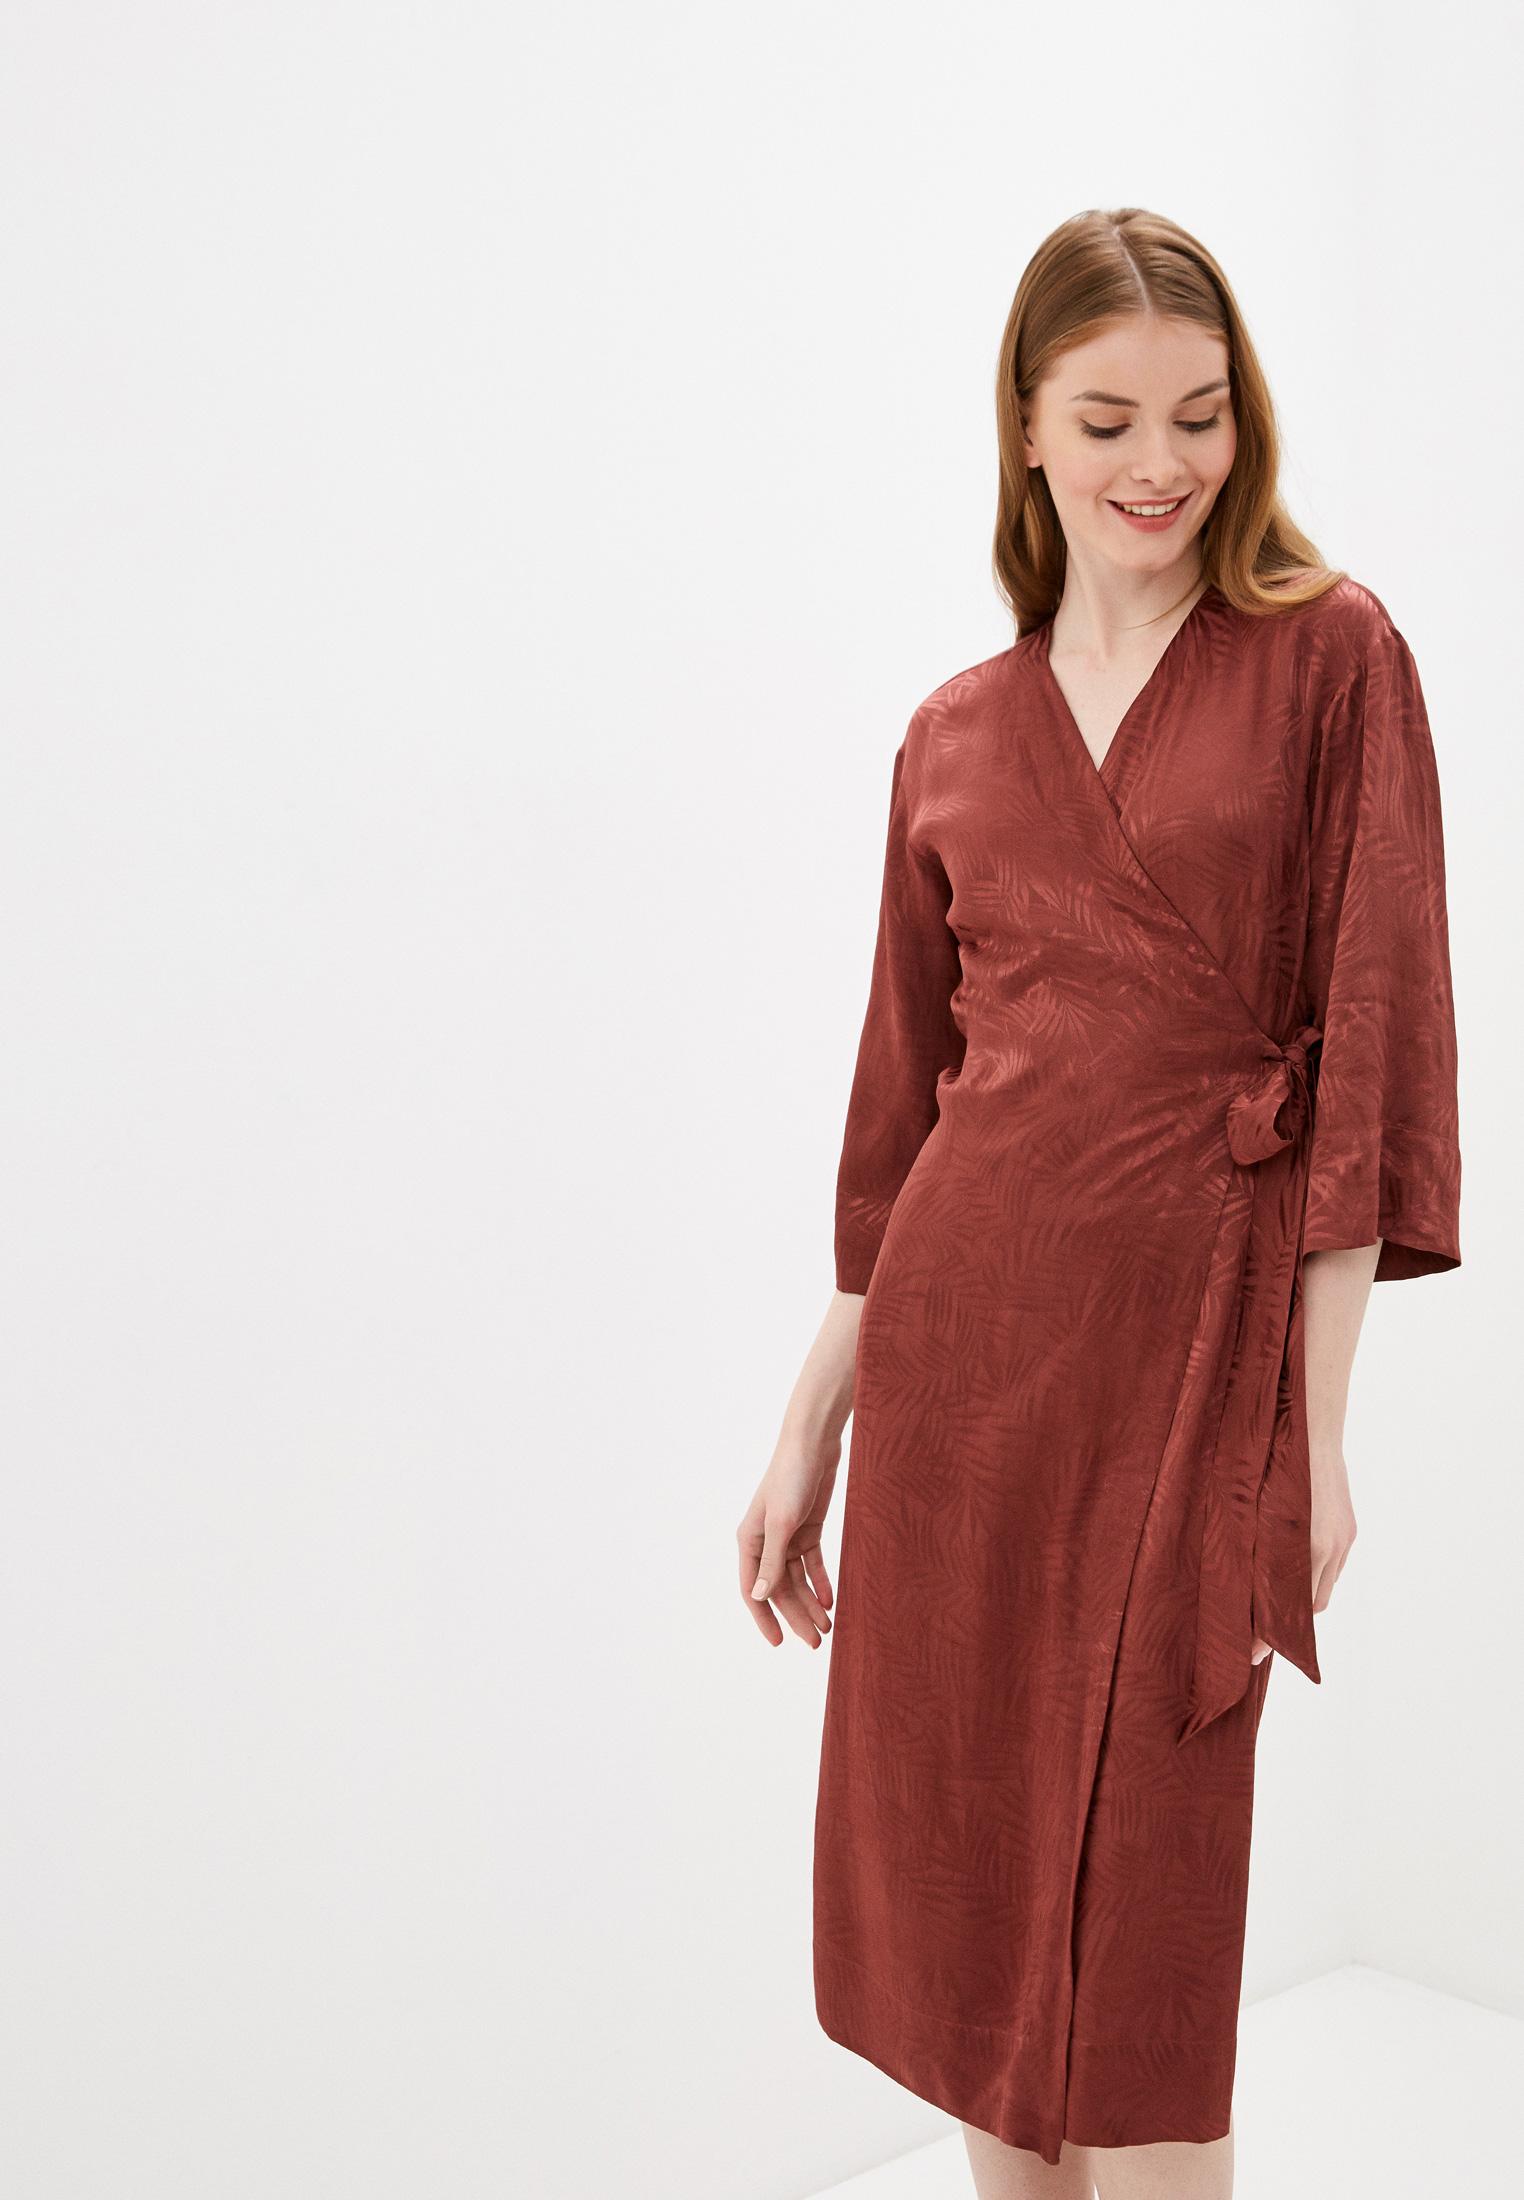 LIVCO CORSETTI Yasmeen Luxury Super Soft Decorative Satin Dressing Gown